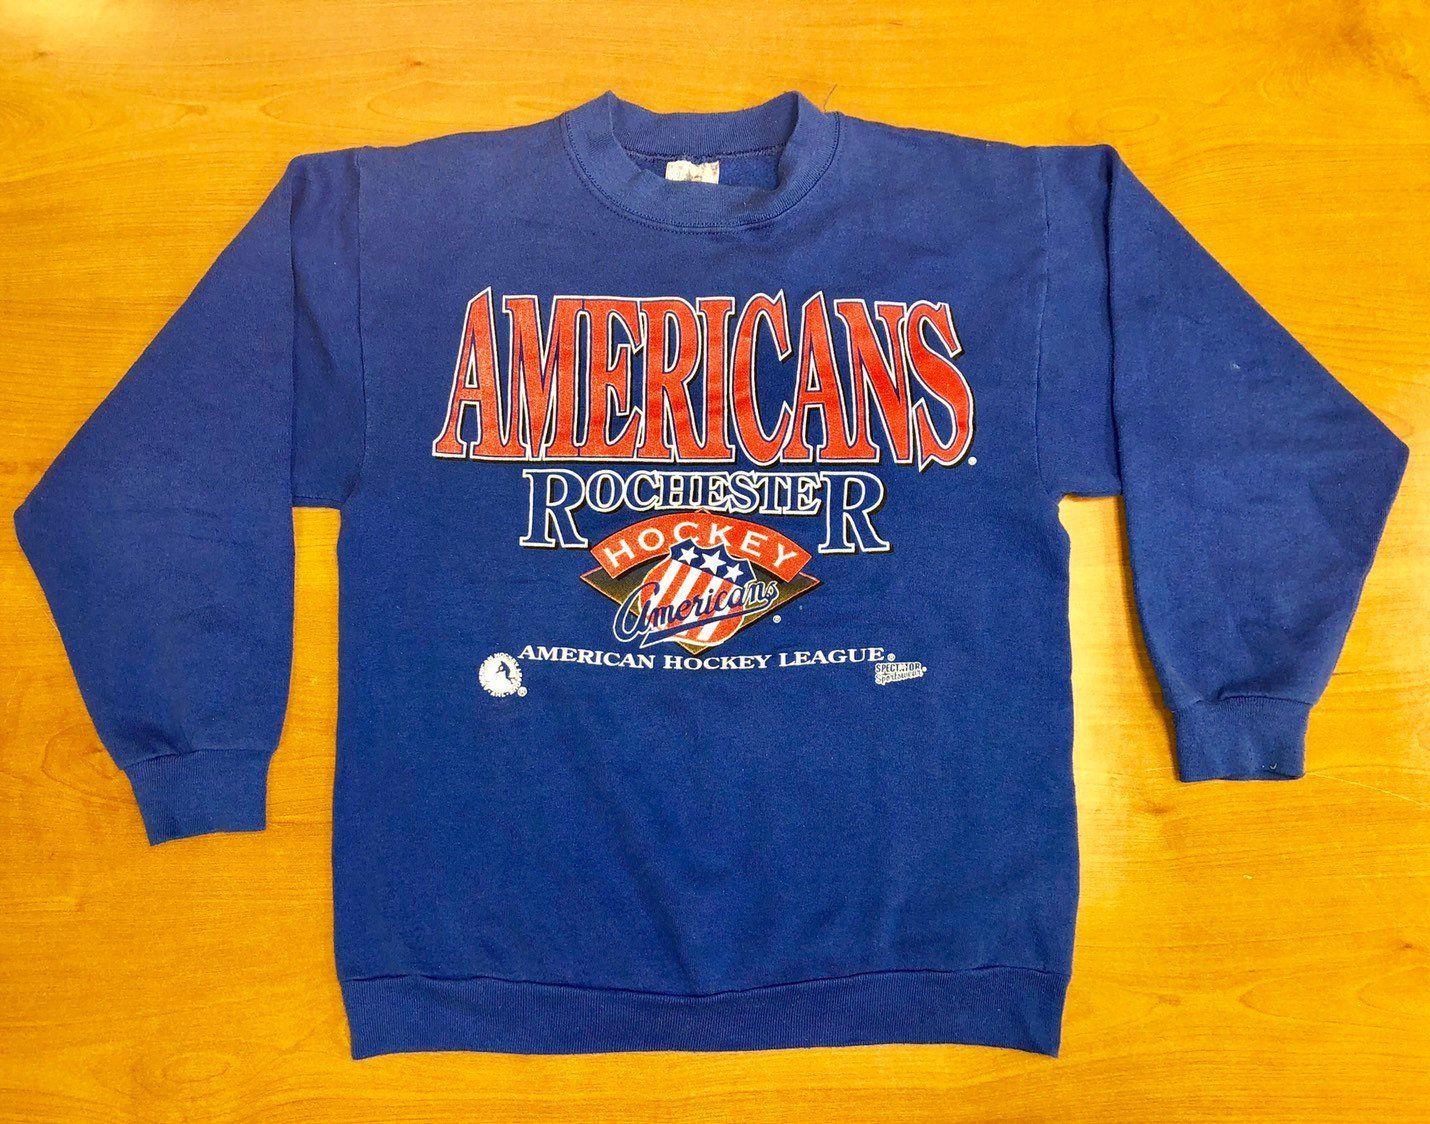 Vintage 1980s Rochester Americans Ahl Hockey Crewneck Sweatshirt Buffalo Sabres Stanley Cup Final Jersey Sports Sweatshirts American Hockey League Sweatshirts [ 1124 x 1430 Pixel ]